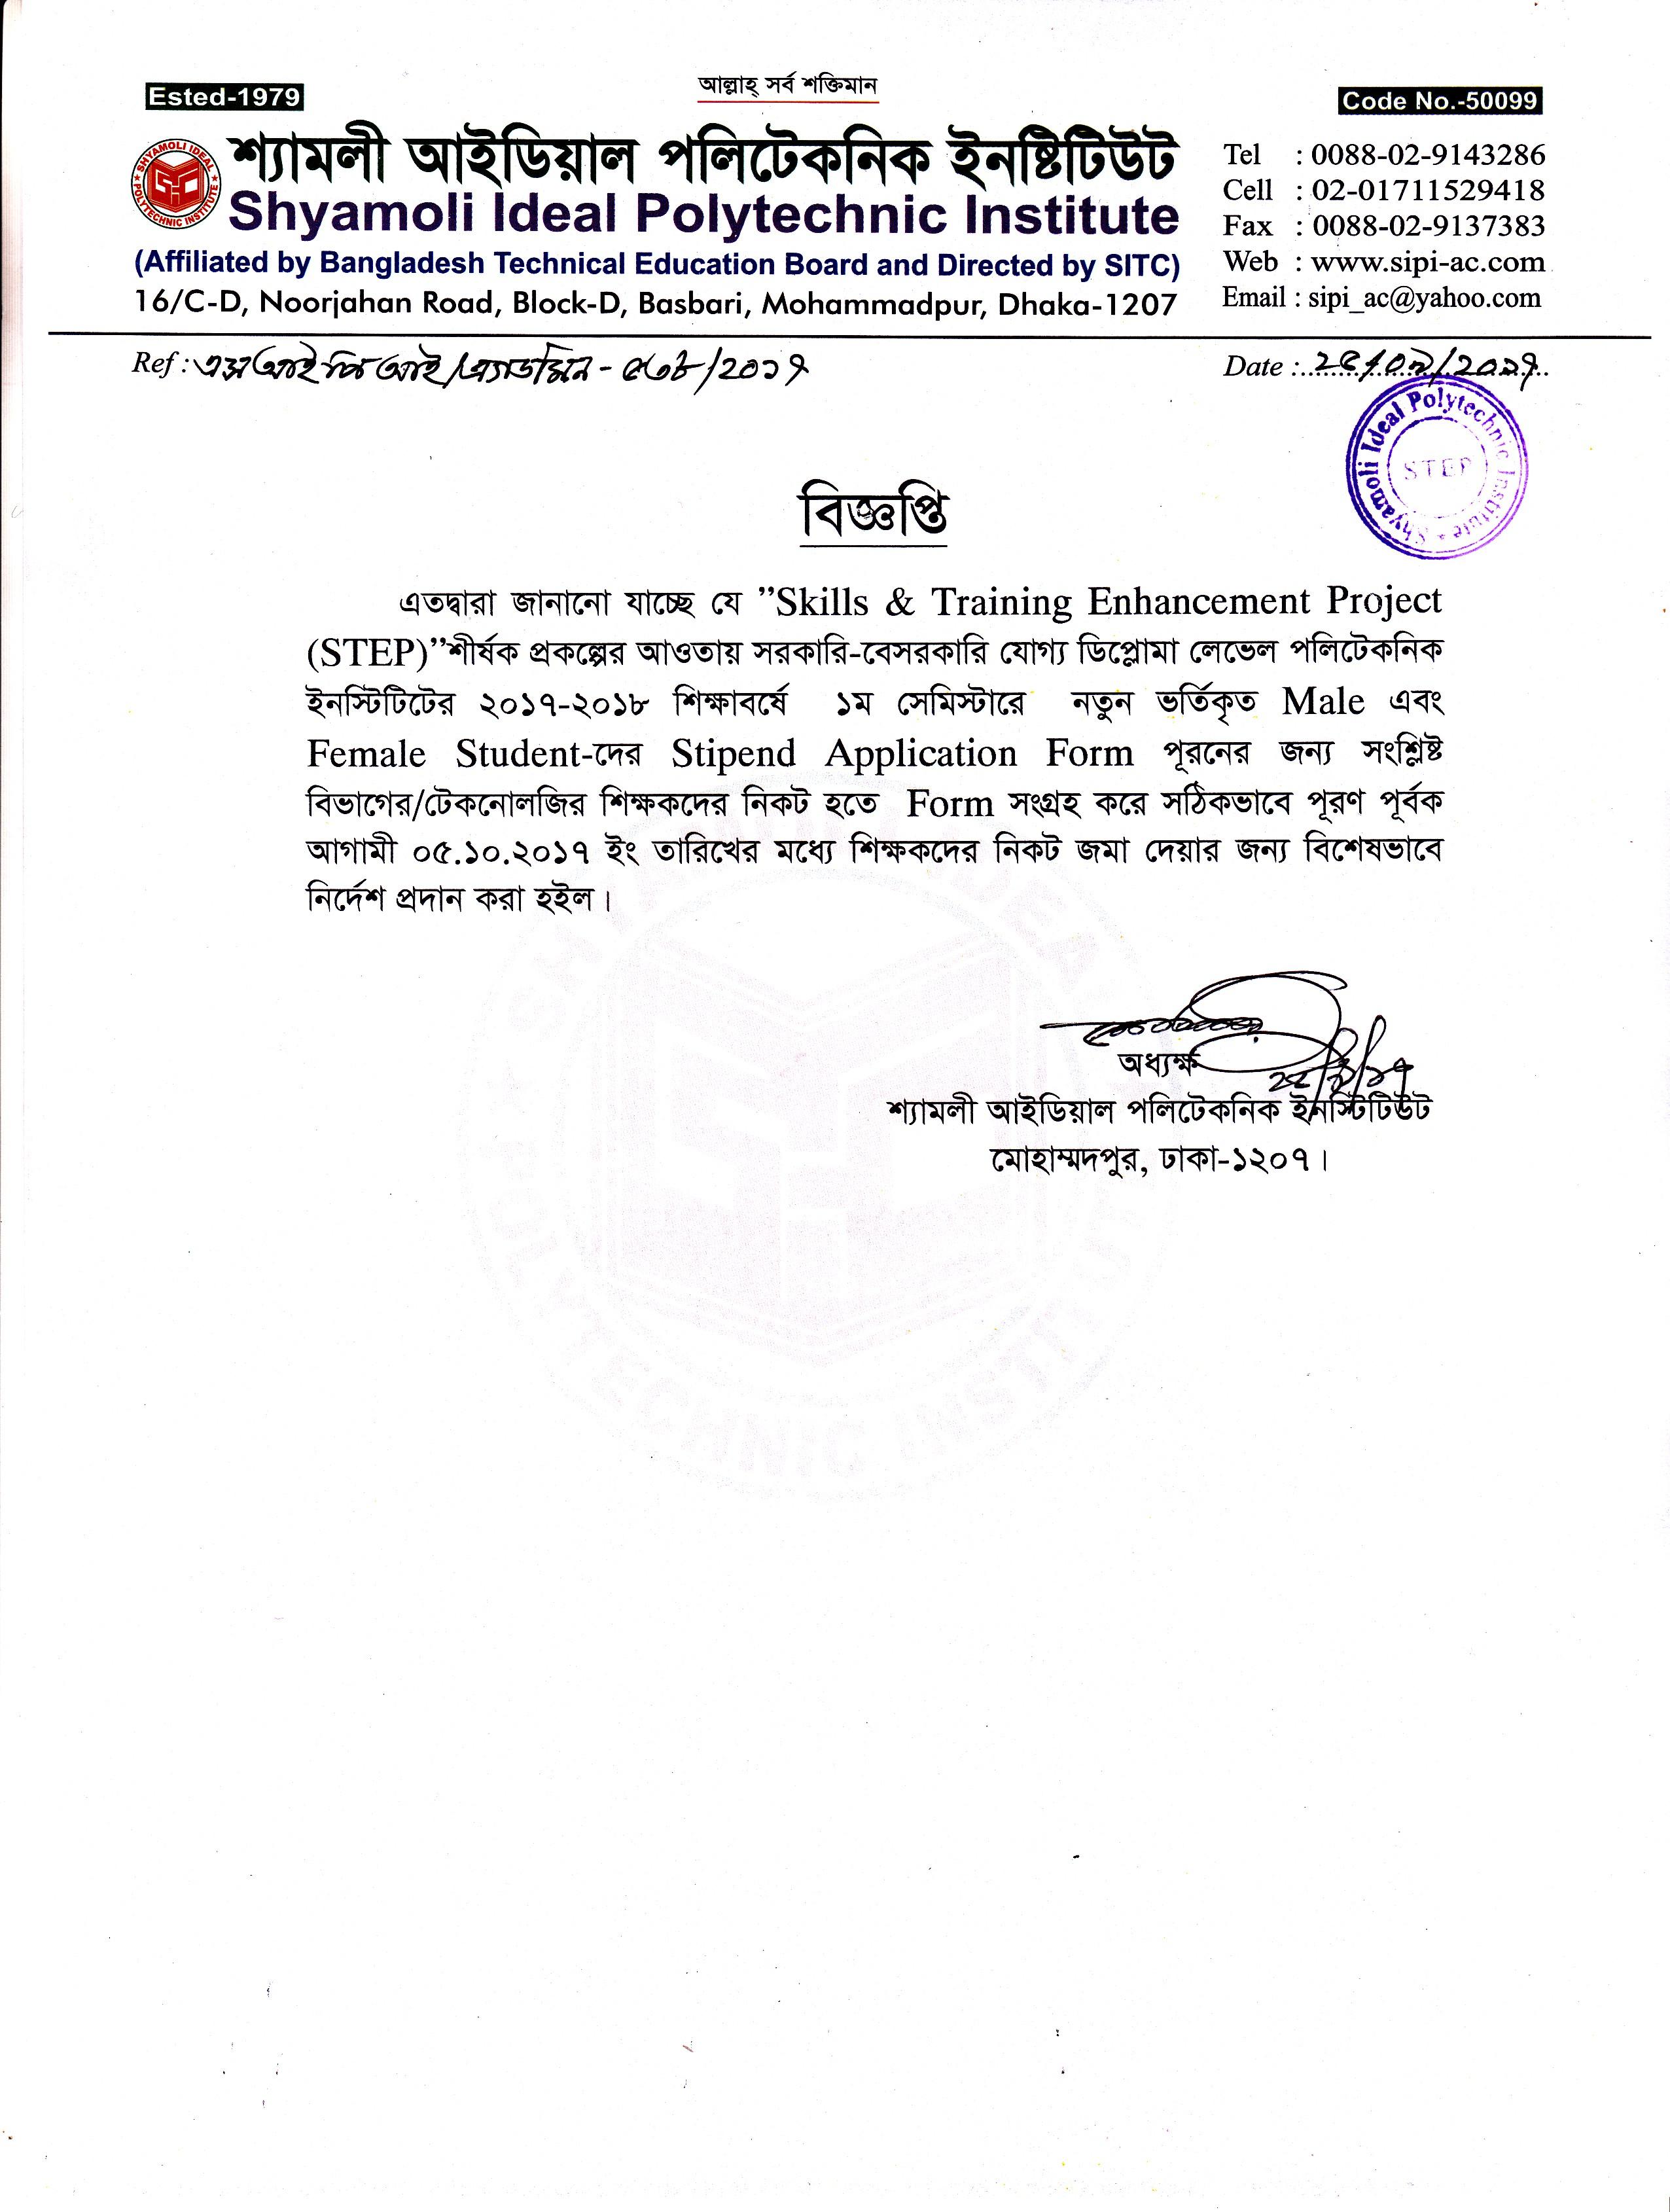 Shyamoli Ideal Polytechnic Insitute